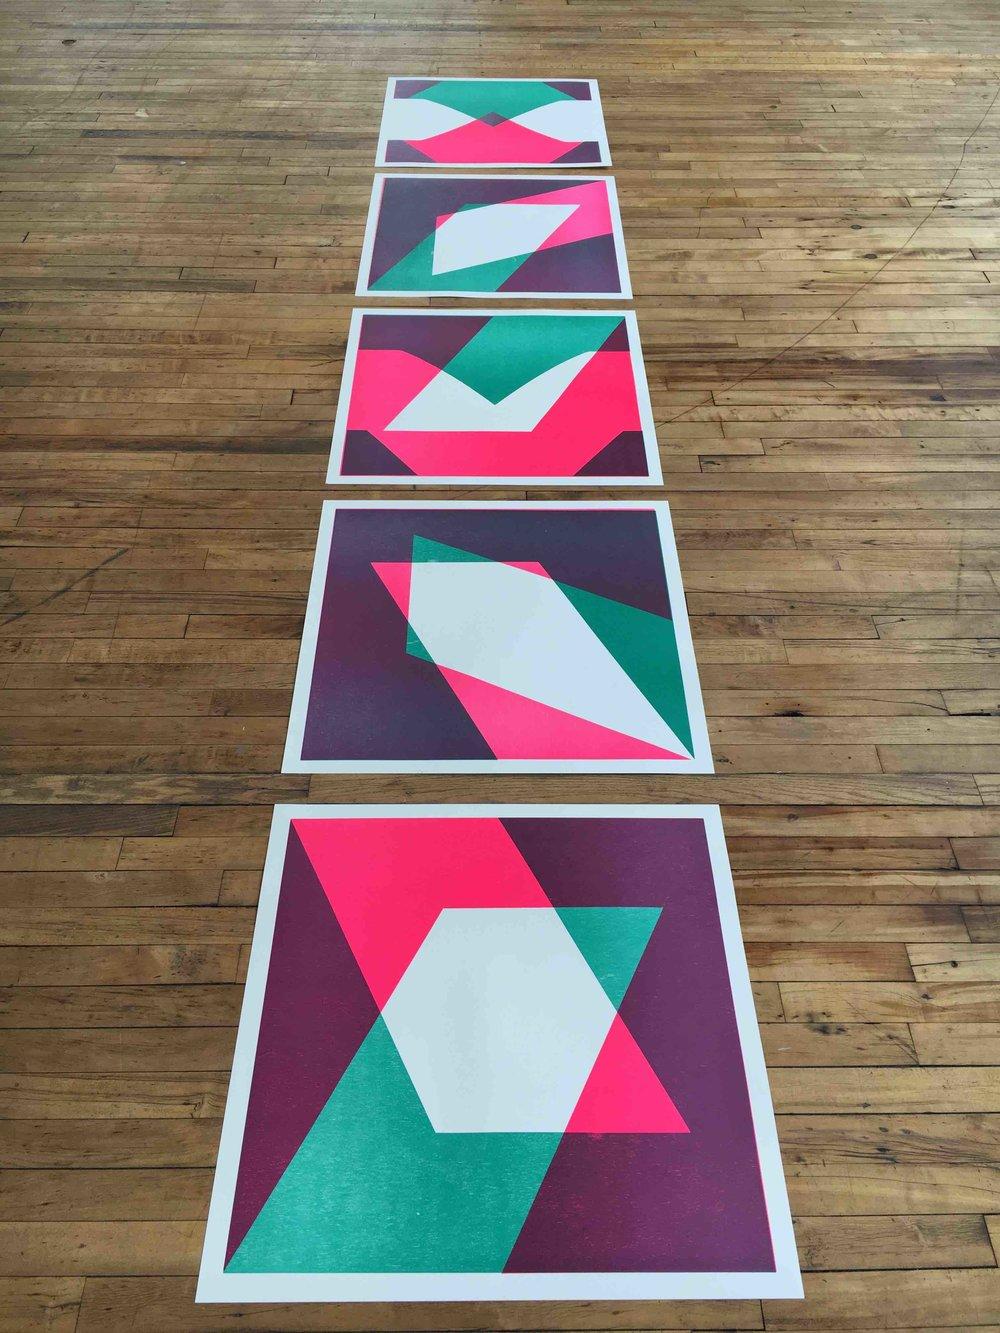 26x26 prints.jpg